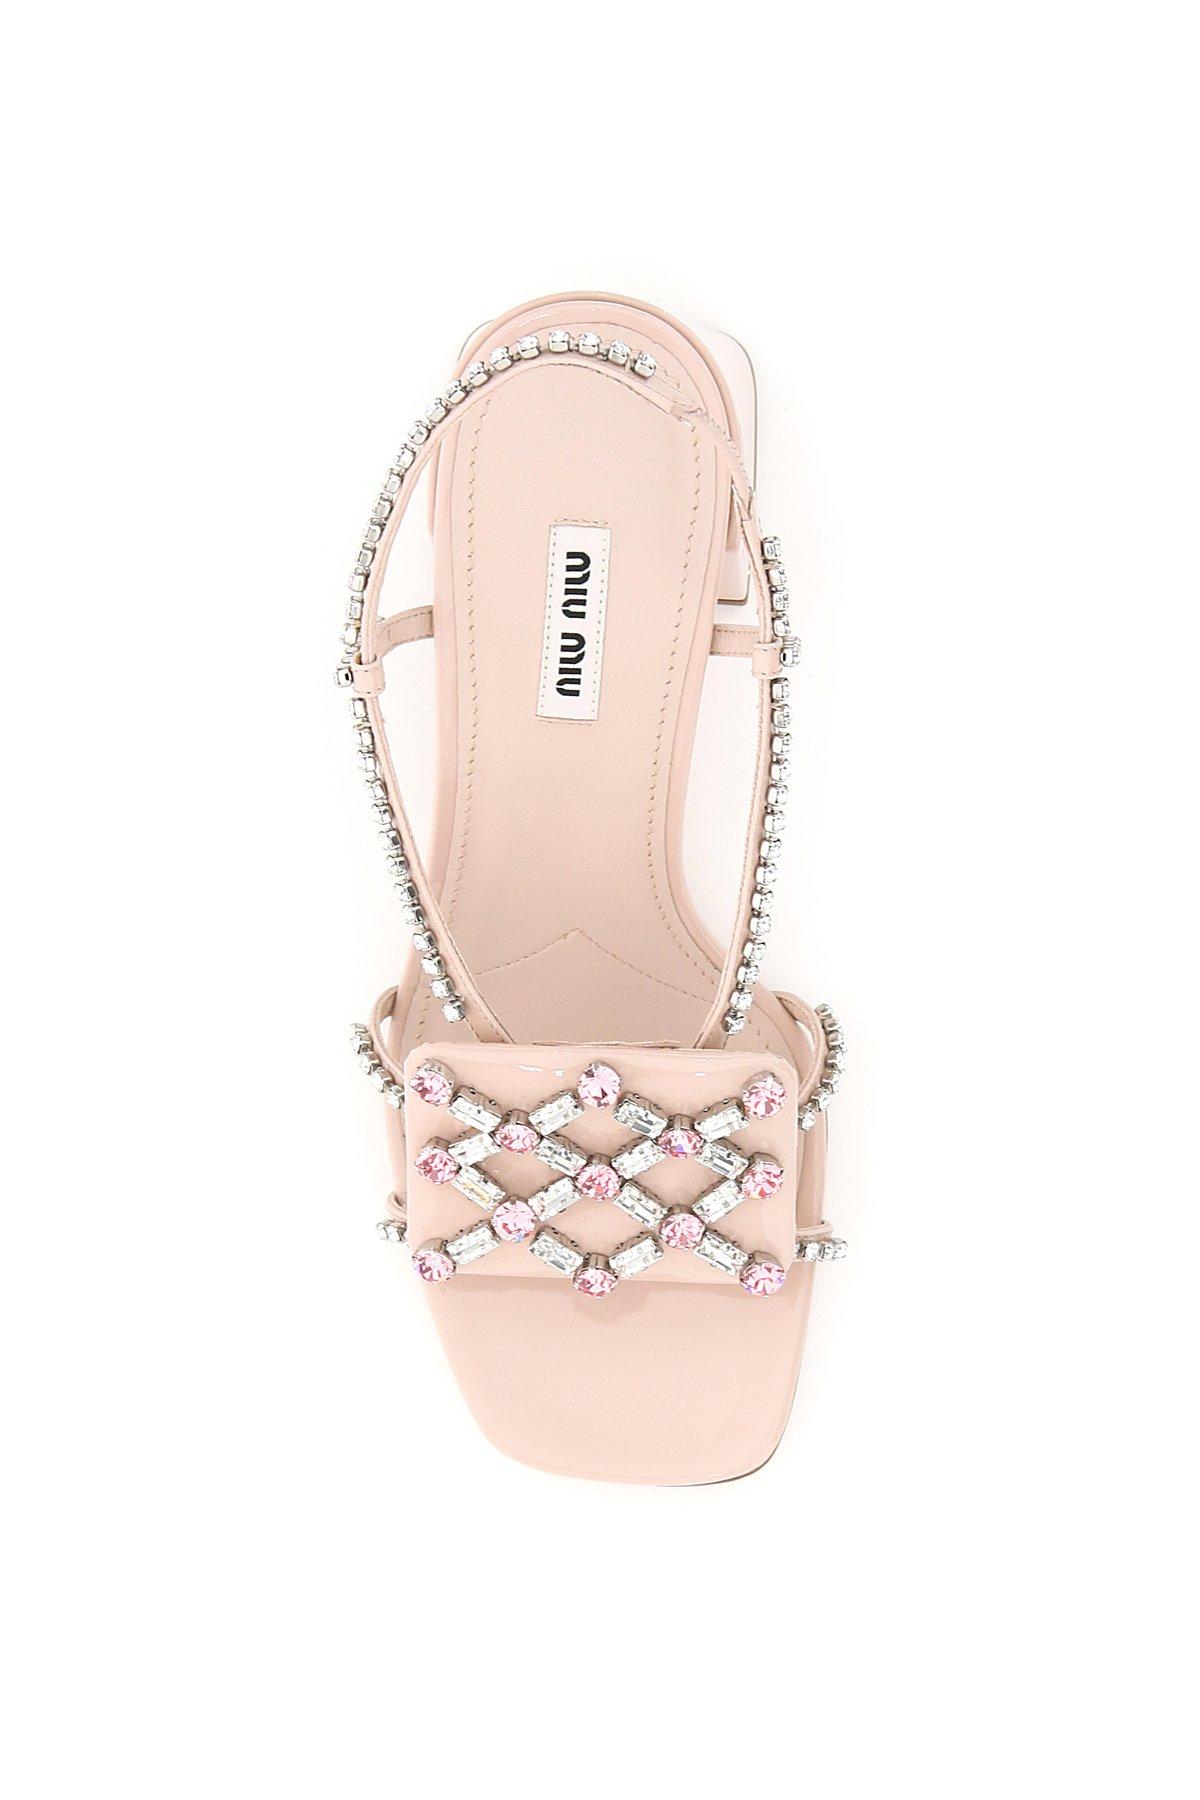 Miu miu sandali ricamo crystal